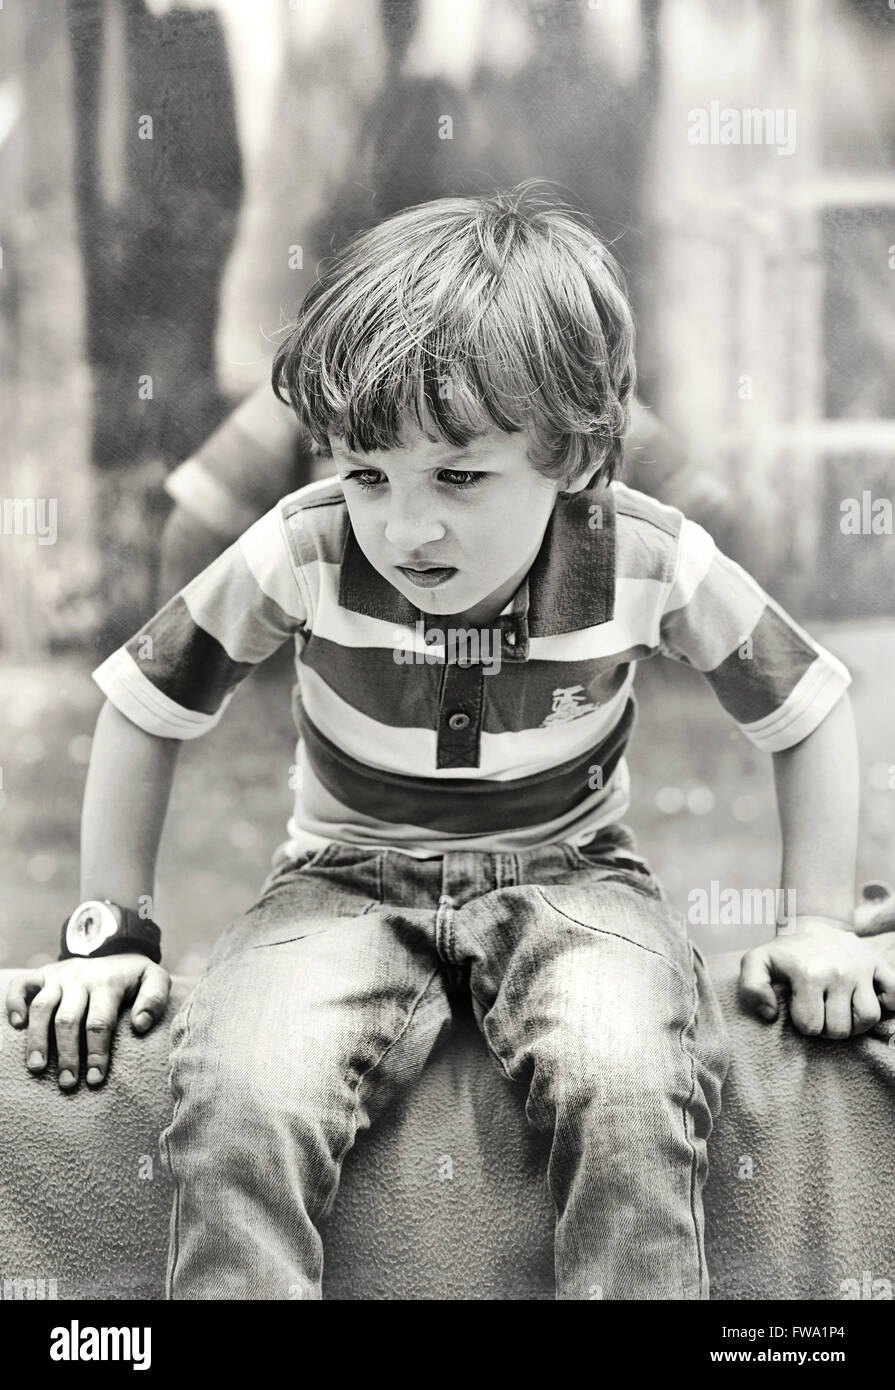 Enojado pequeño niño jugando Foto de stock